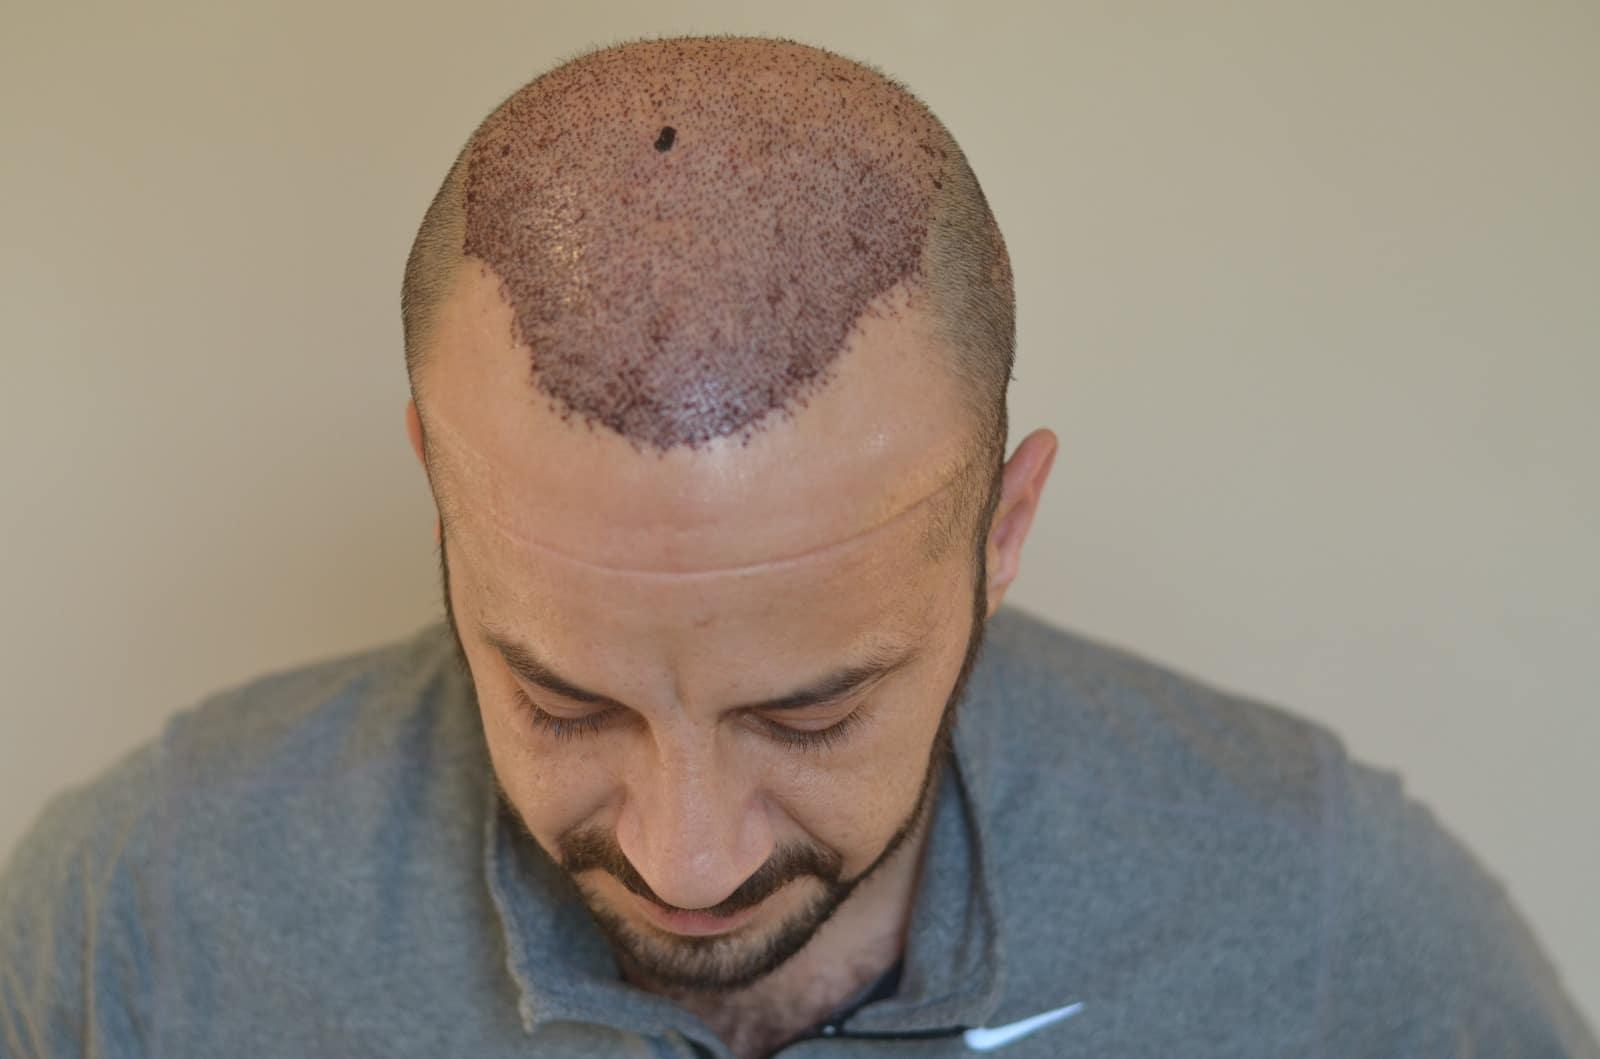 haar-transplantation-in-der-türkei-istanbul (12)